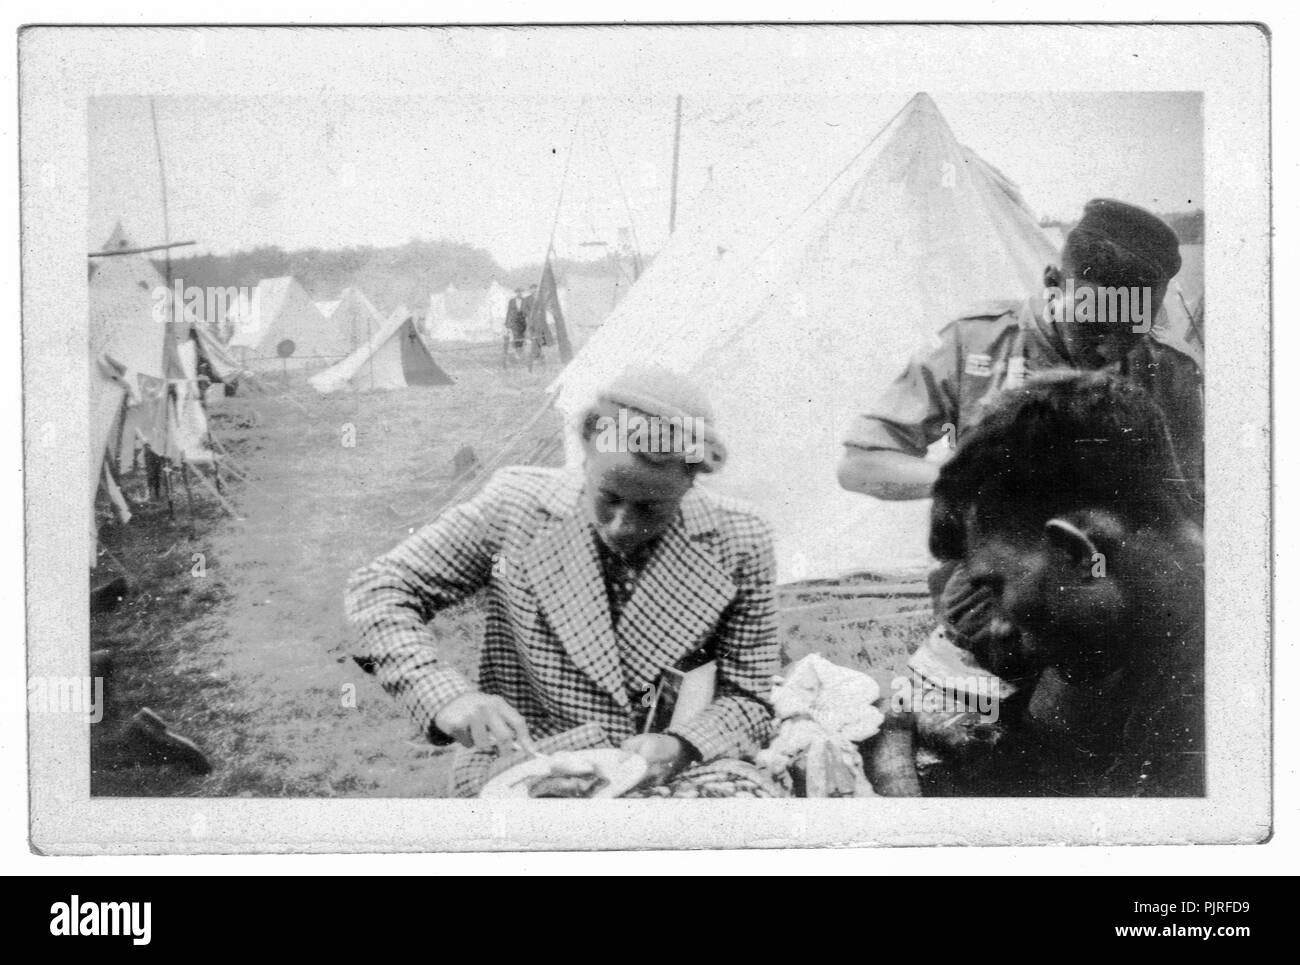 5º Jamboree Scout Mundial, celebrada en Bloemendaal Vogelenzang Holanda, Holanda,1937 Foto de stock